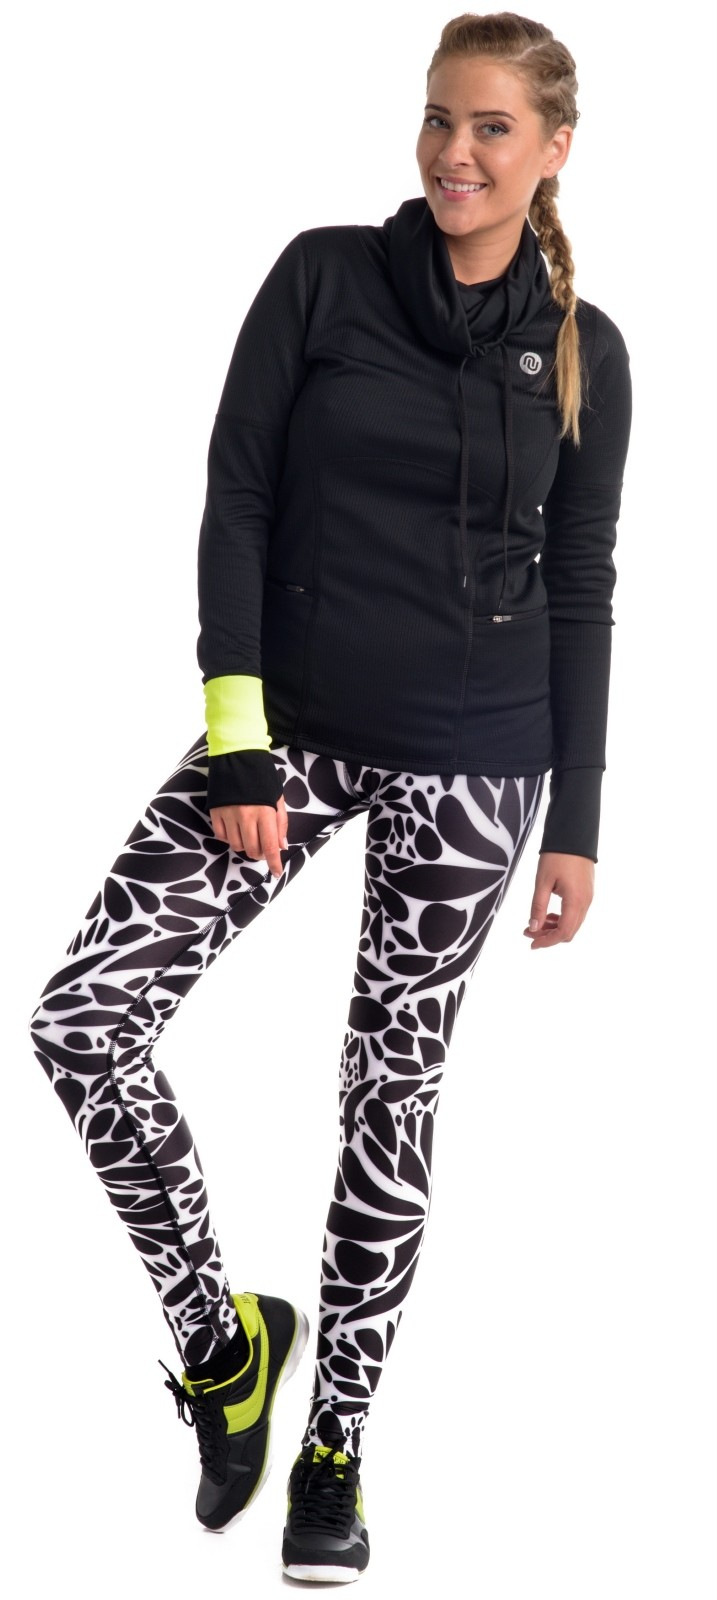 nessi damen sport leggings oslk laufhose fitnesshose. Black Bedroom Furniture Sets. Home Design Ideas